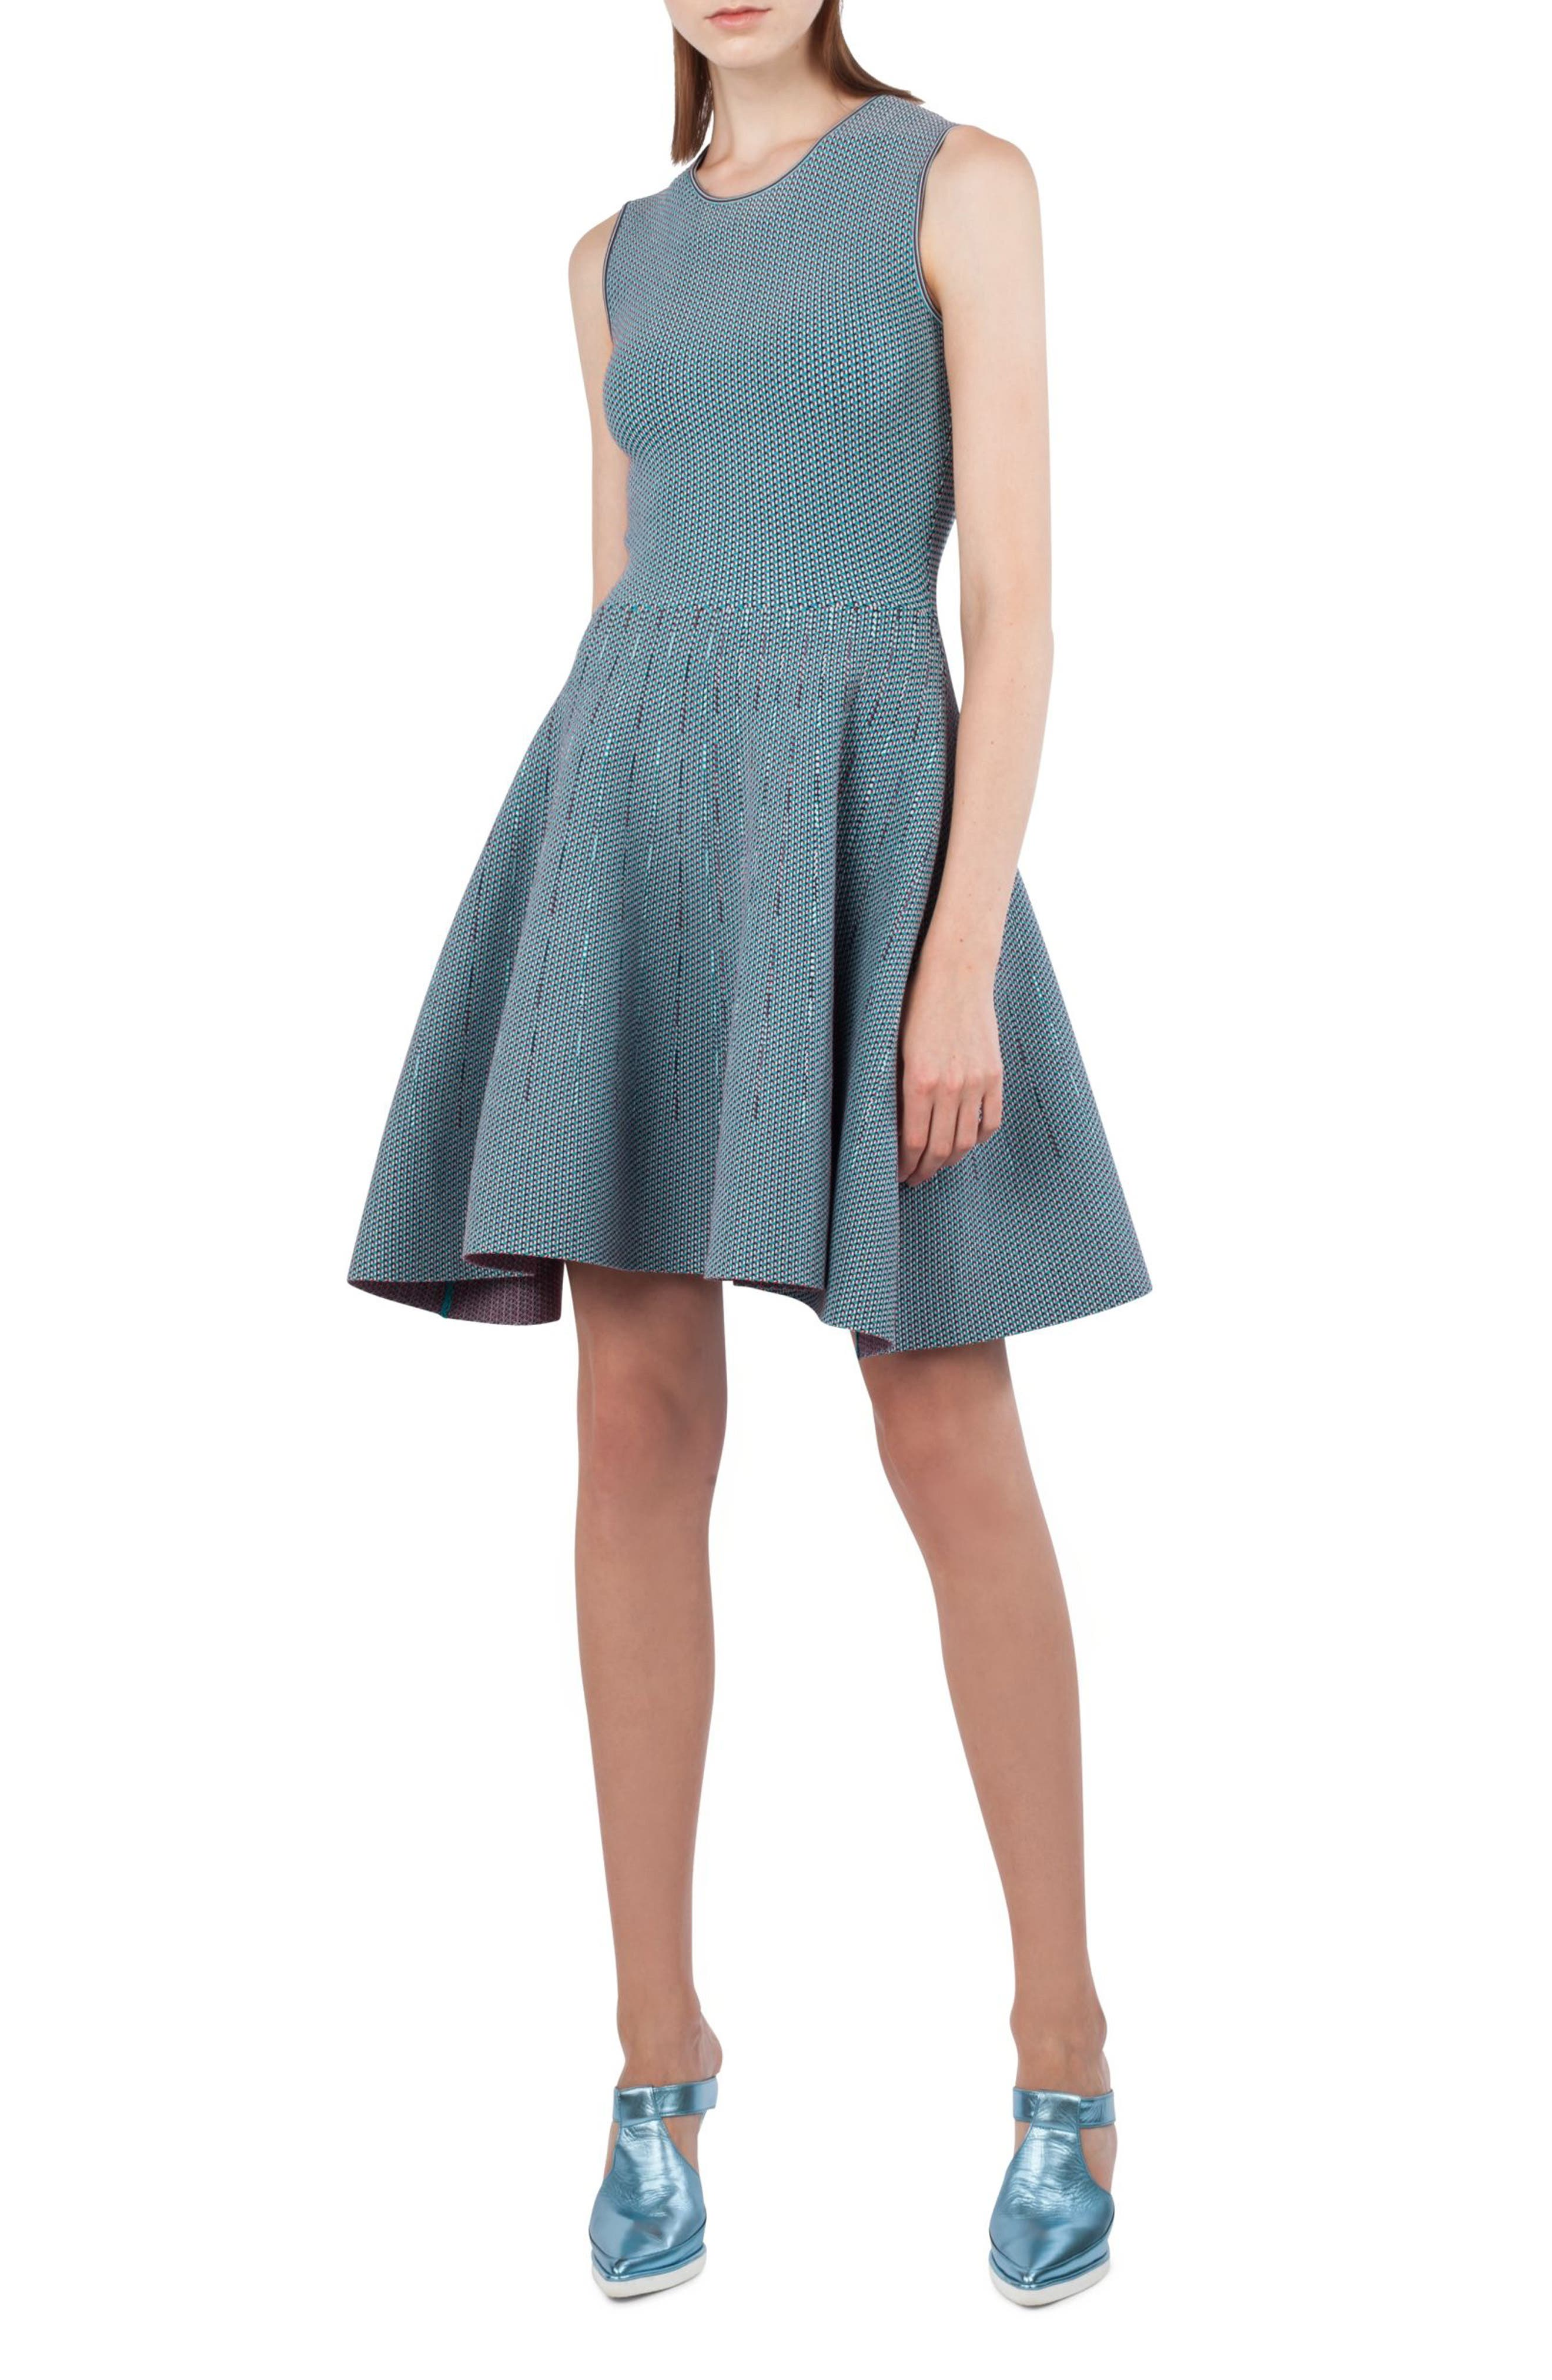 Fantasy Jacquard Knit Dress,                             Main thumbnail 1, color,                             471